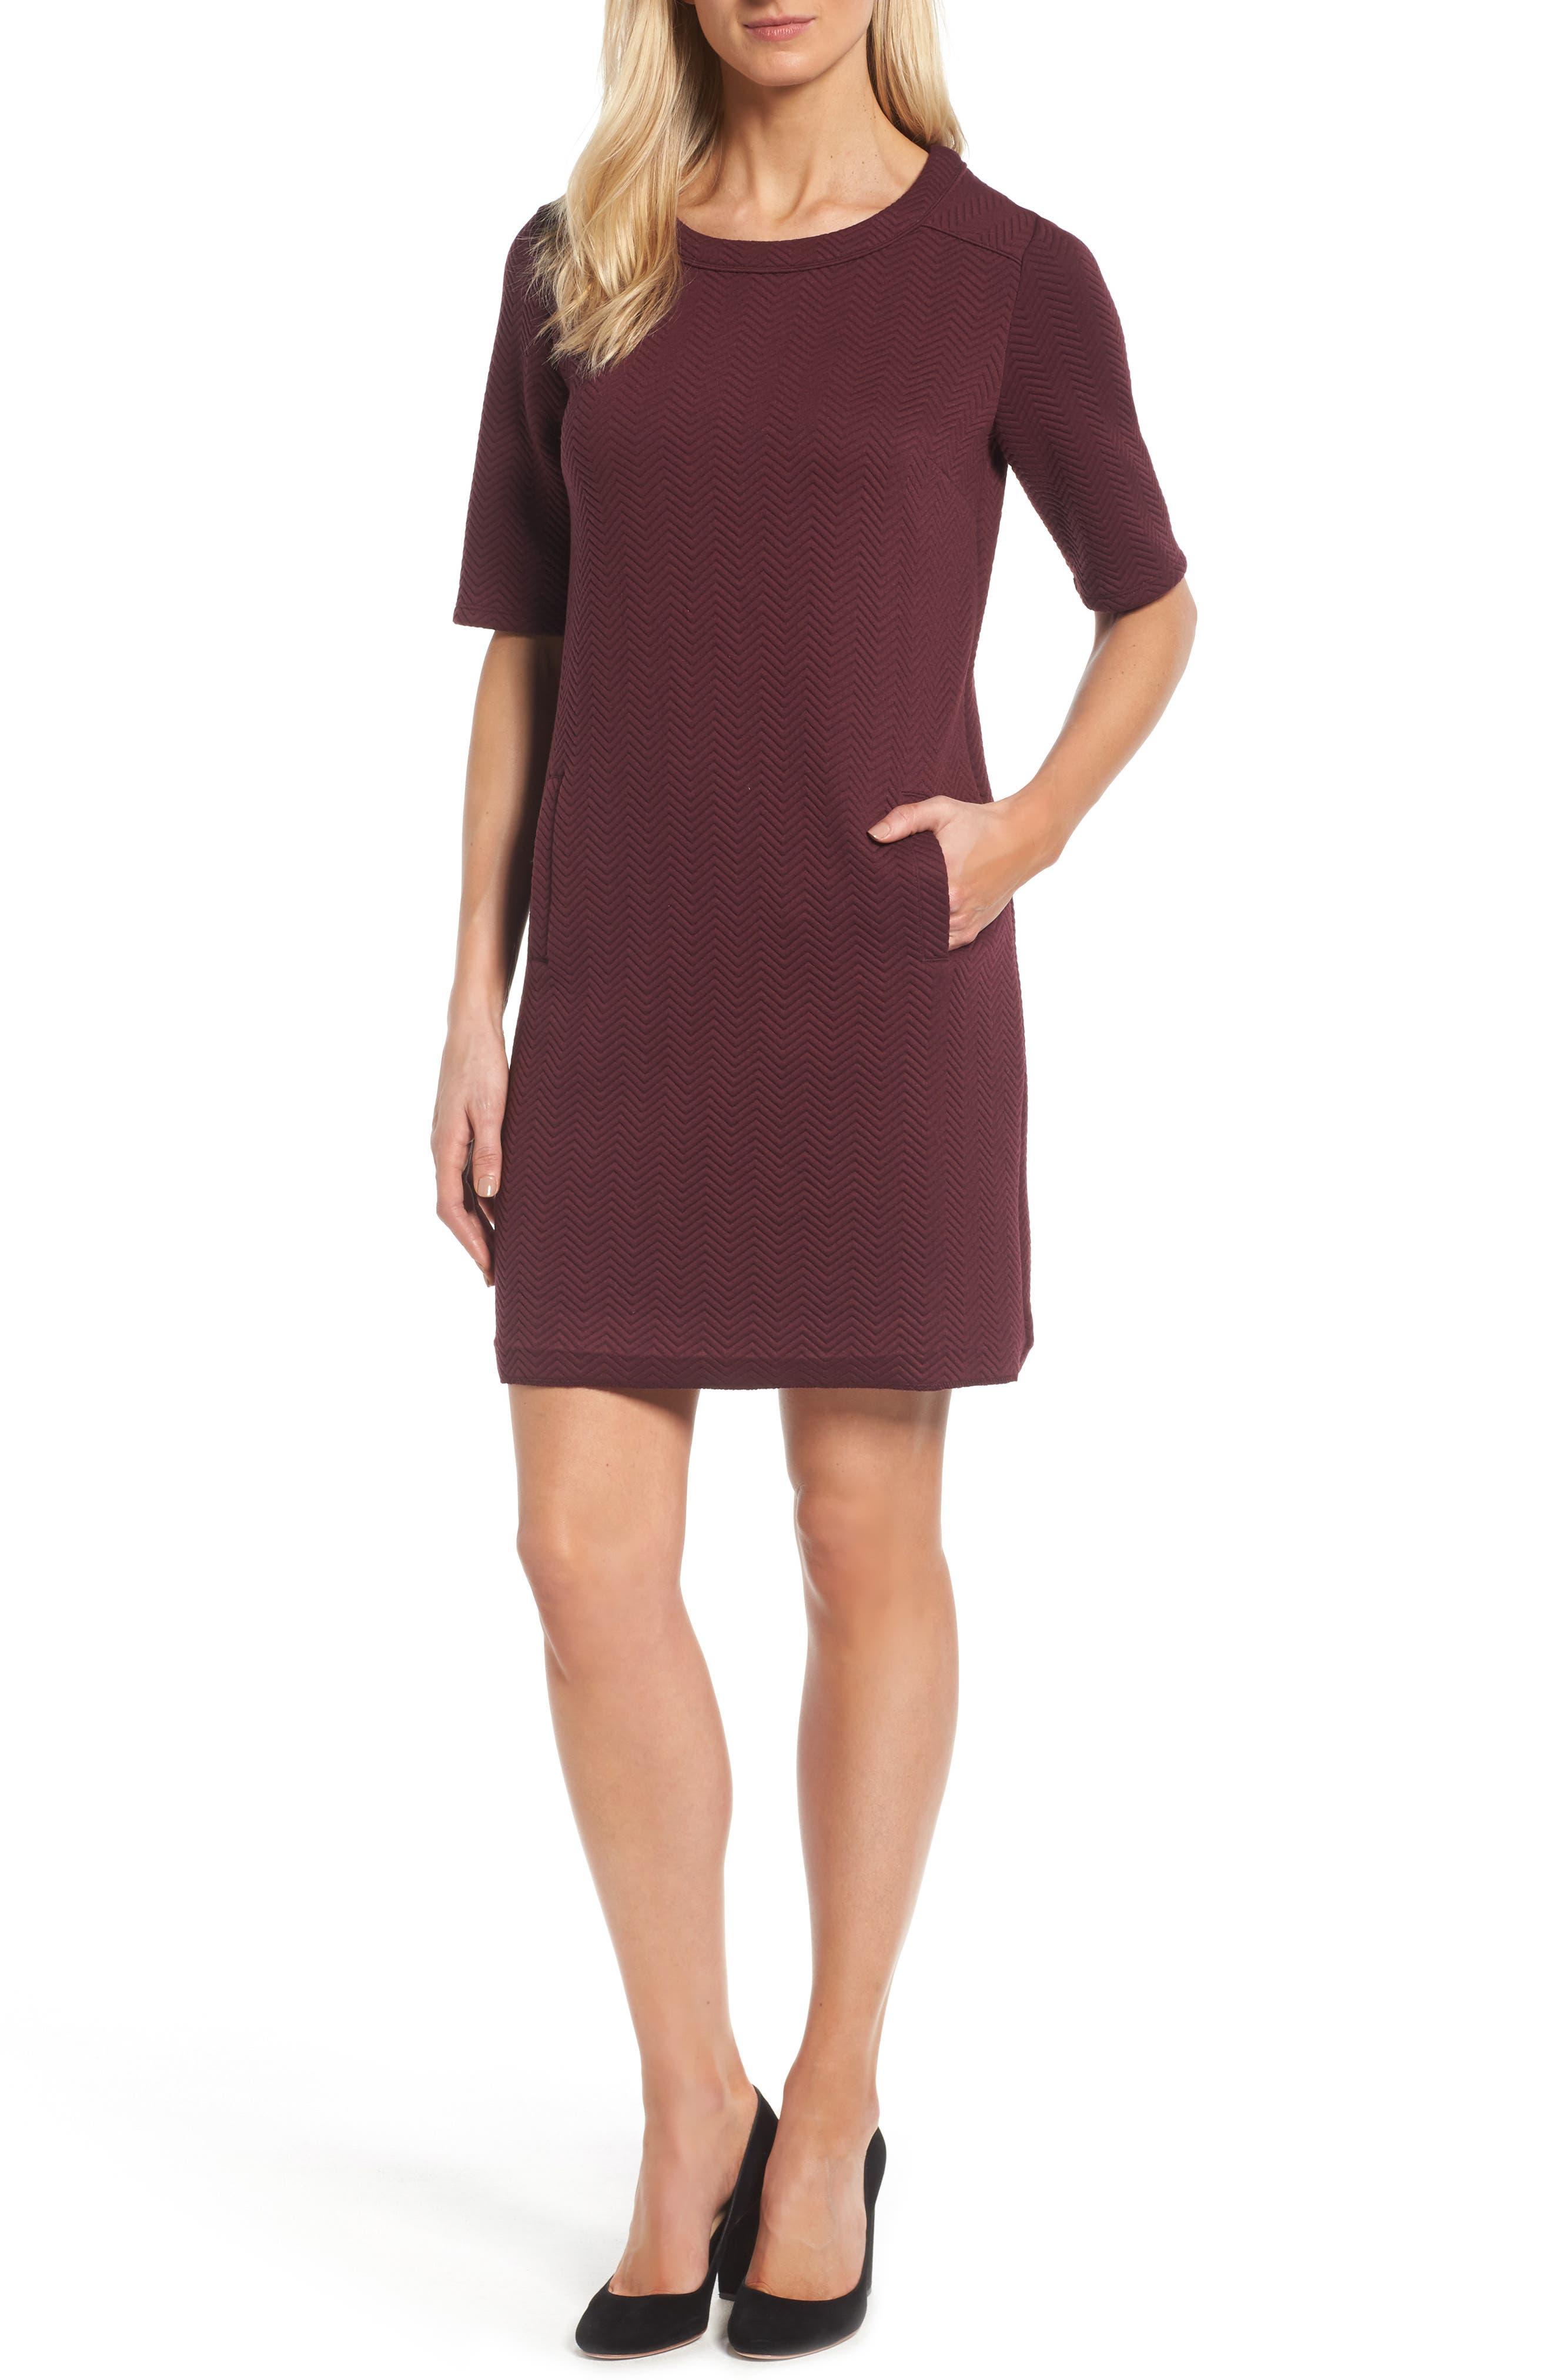 Alternate Image 1 Selected - Halogen® Textured Elbow Sleeve Tunic Dress (Regular & Petite)